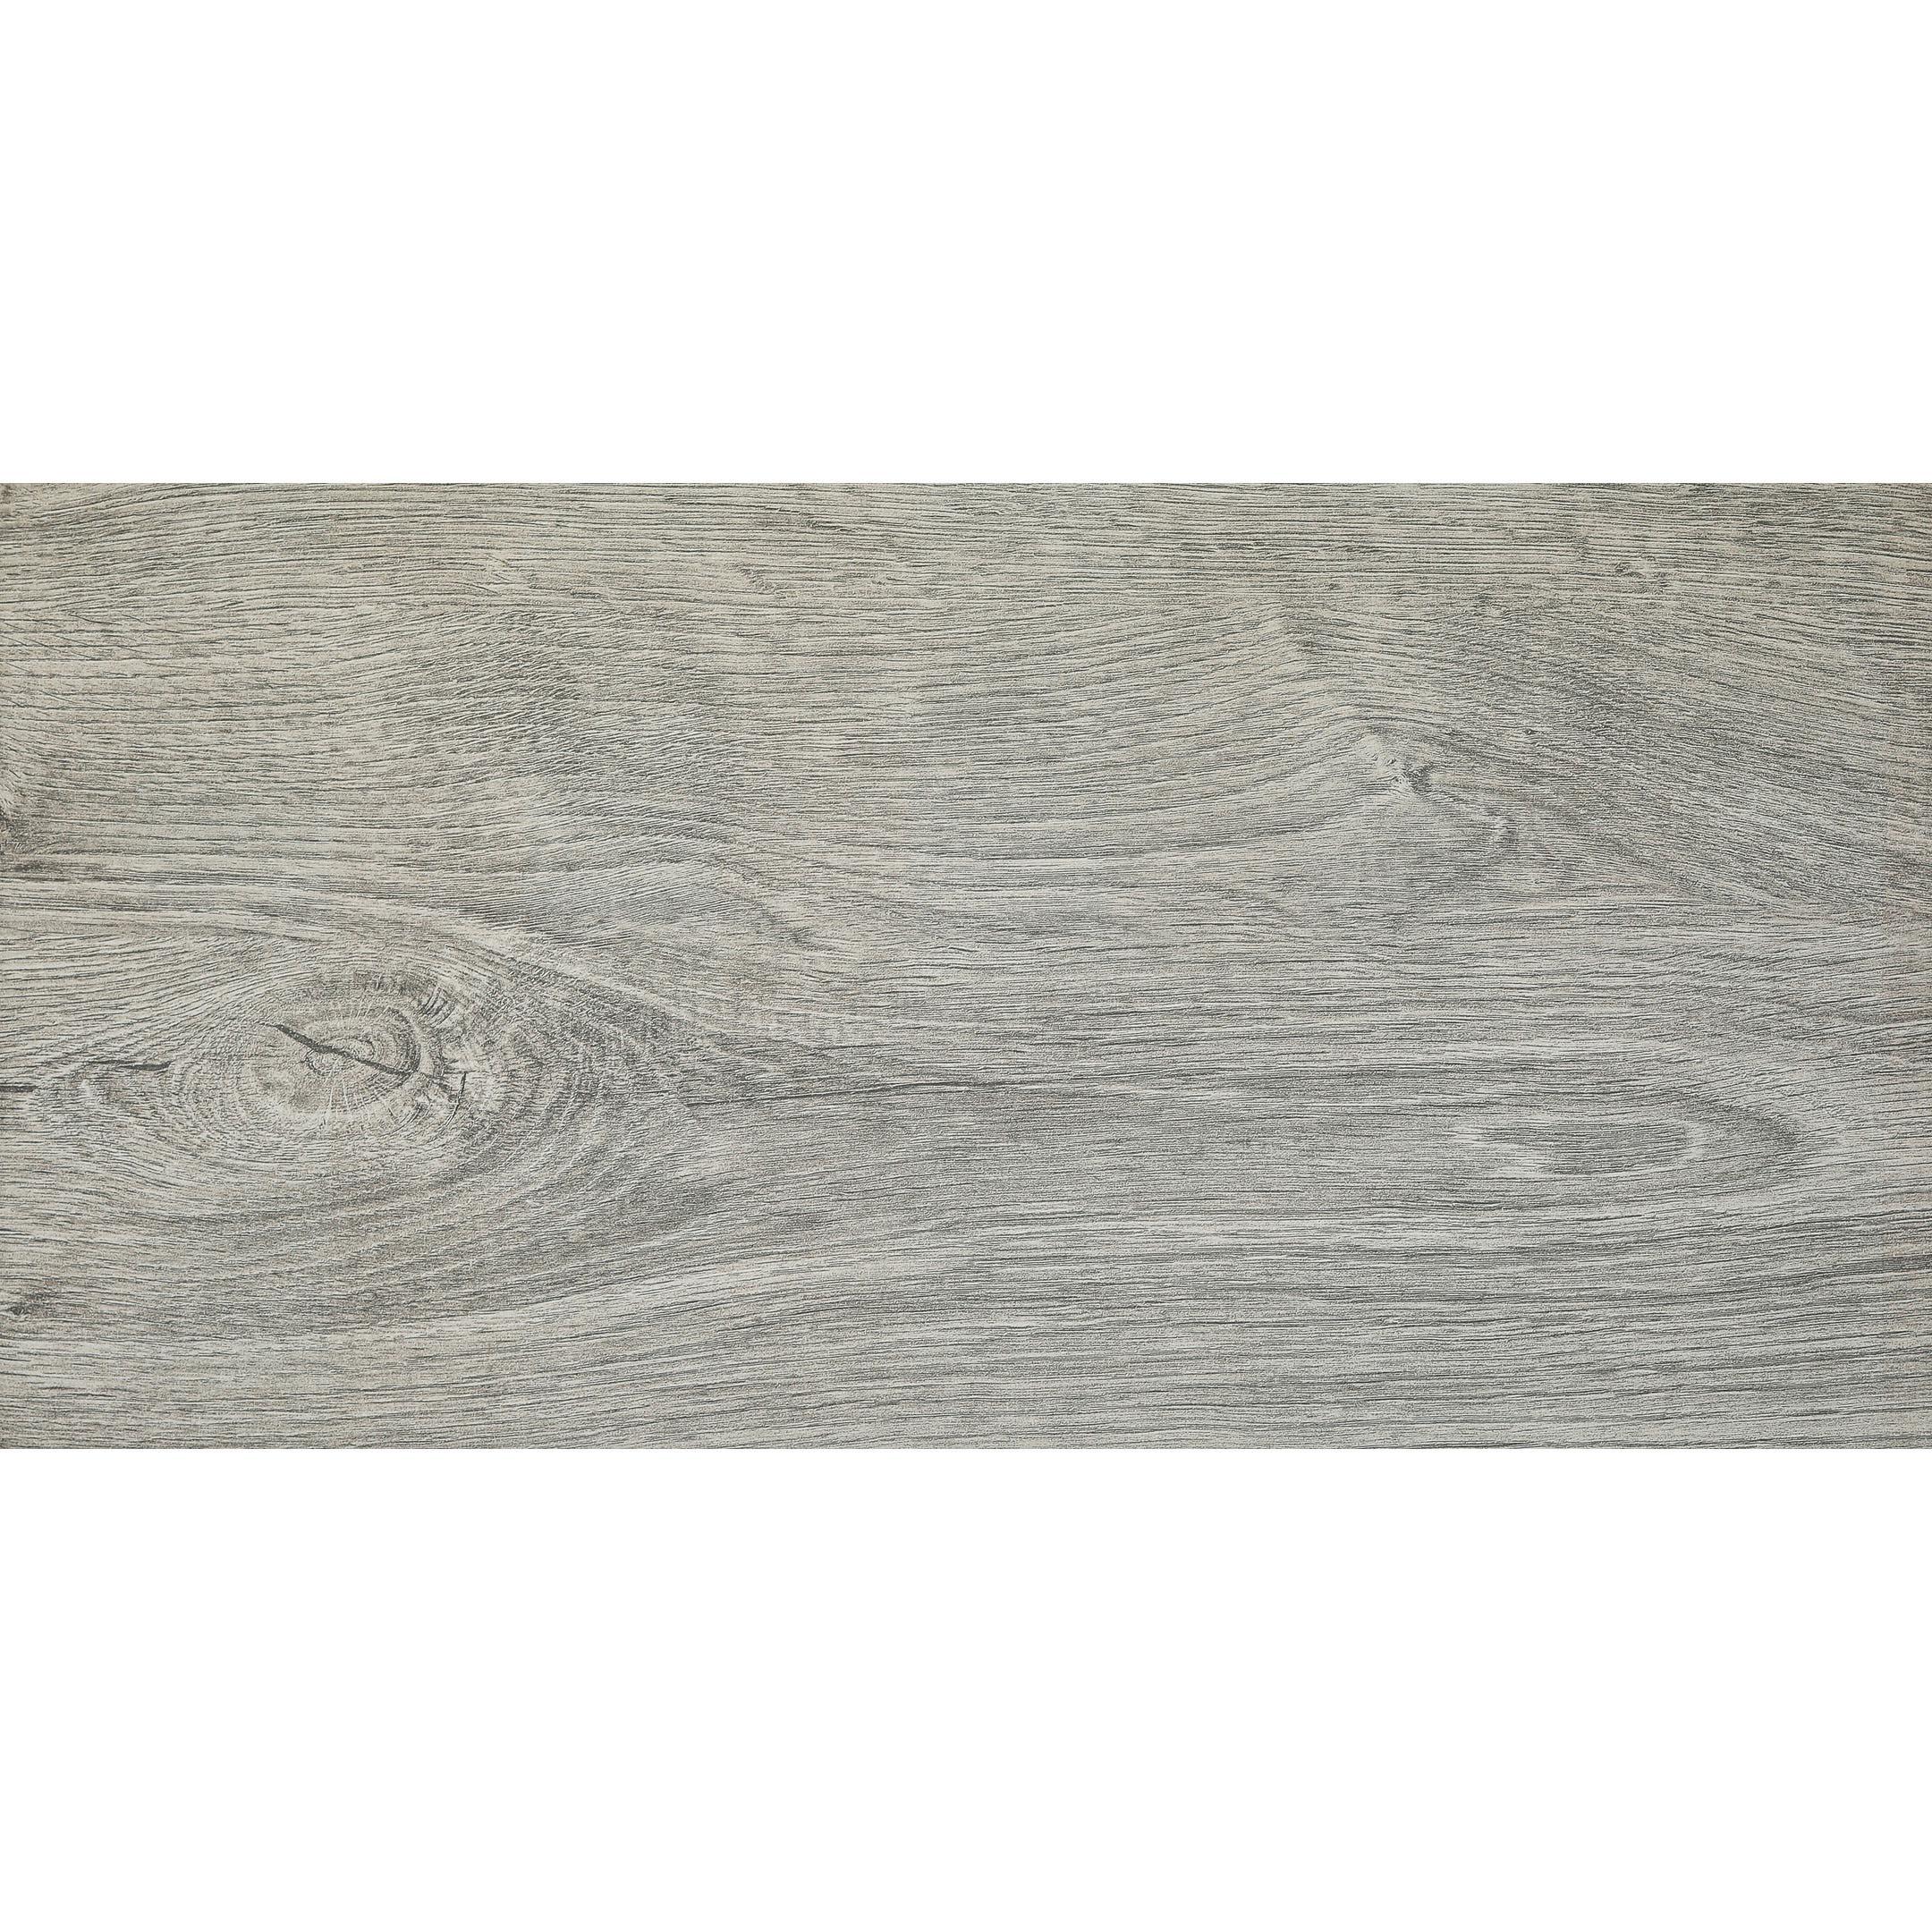 Керамогранит Керамин Рустик Ноттингем 2 темно-серый 600х300х10 мм (8 шт.=1,44 кв.м)